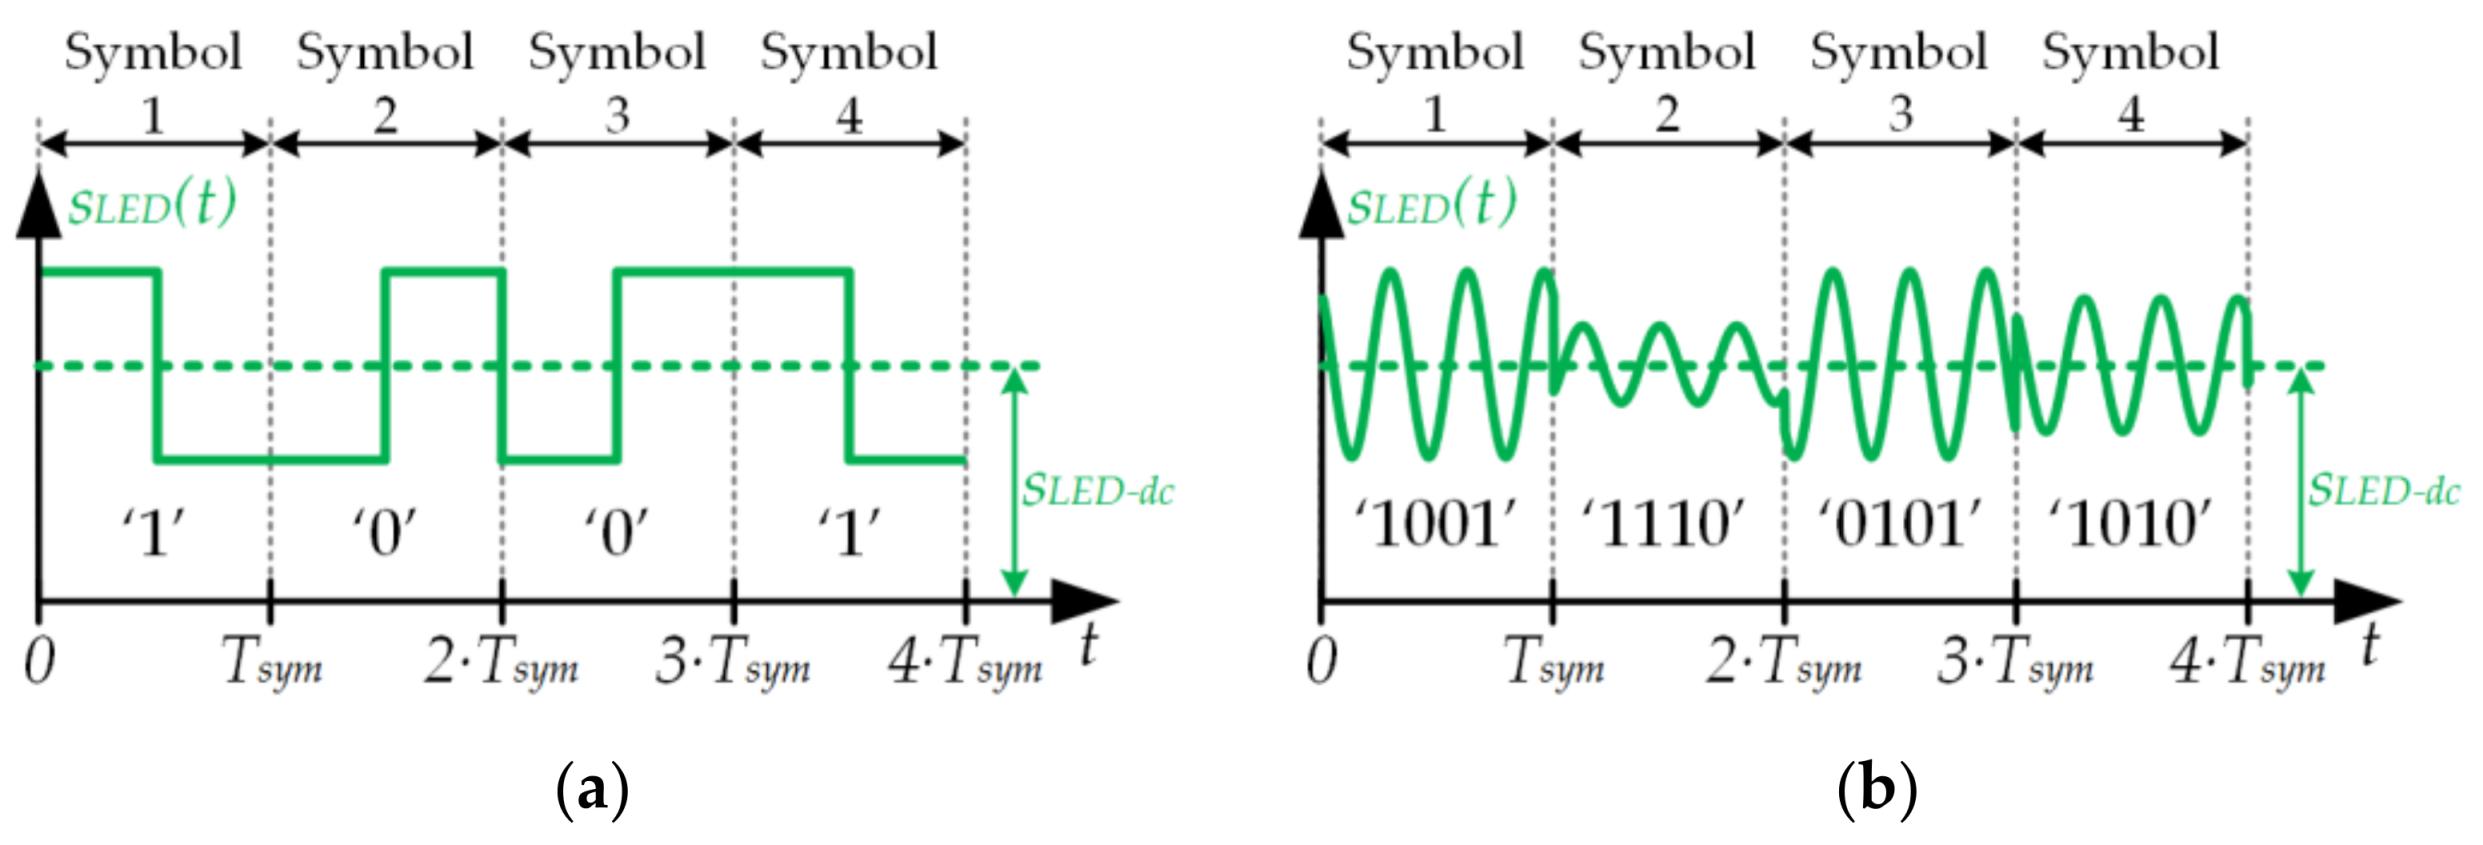 Großzügig Dc Dc Wandler Symbol Bilder - Schaltplan Serie Circuit ...